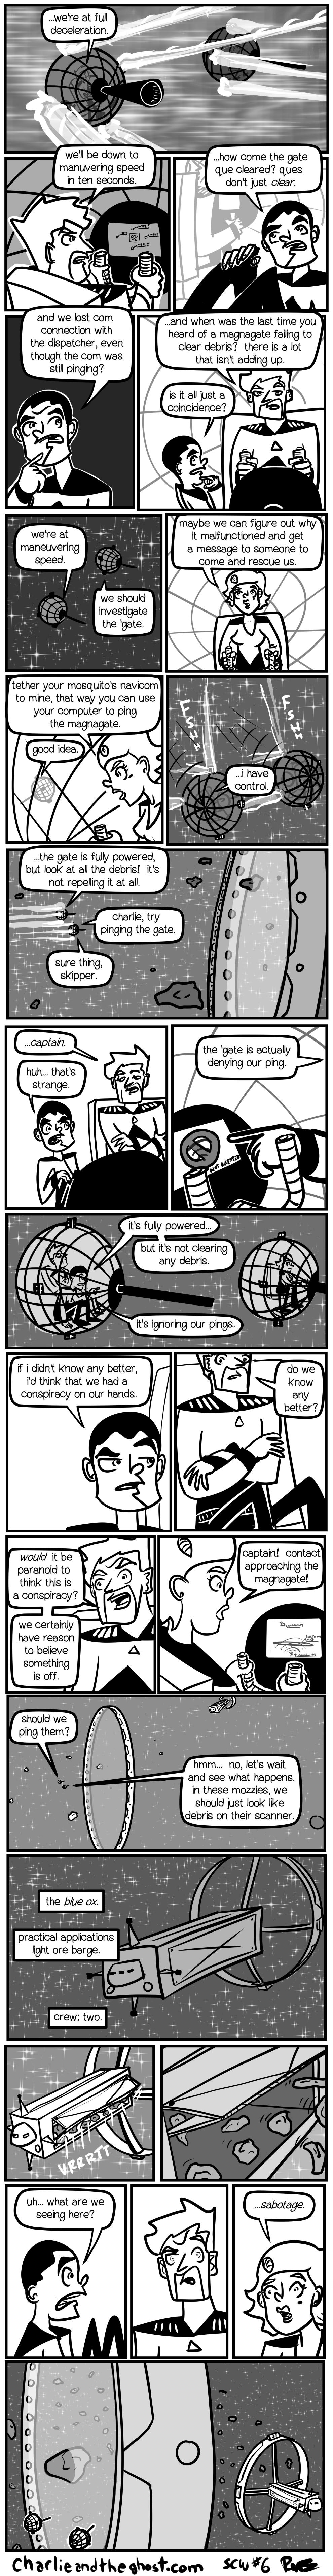 Spacechuck web 6